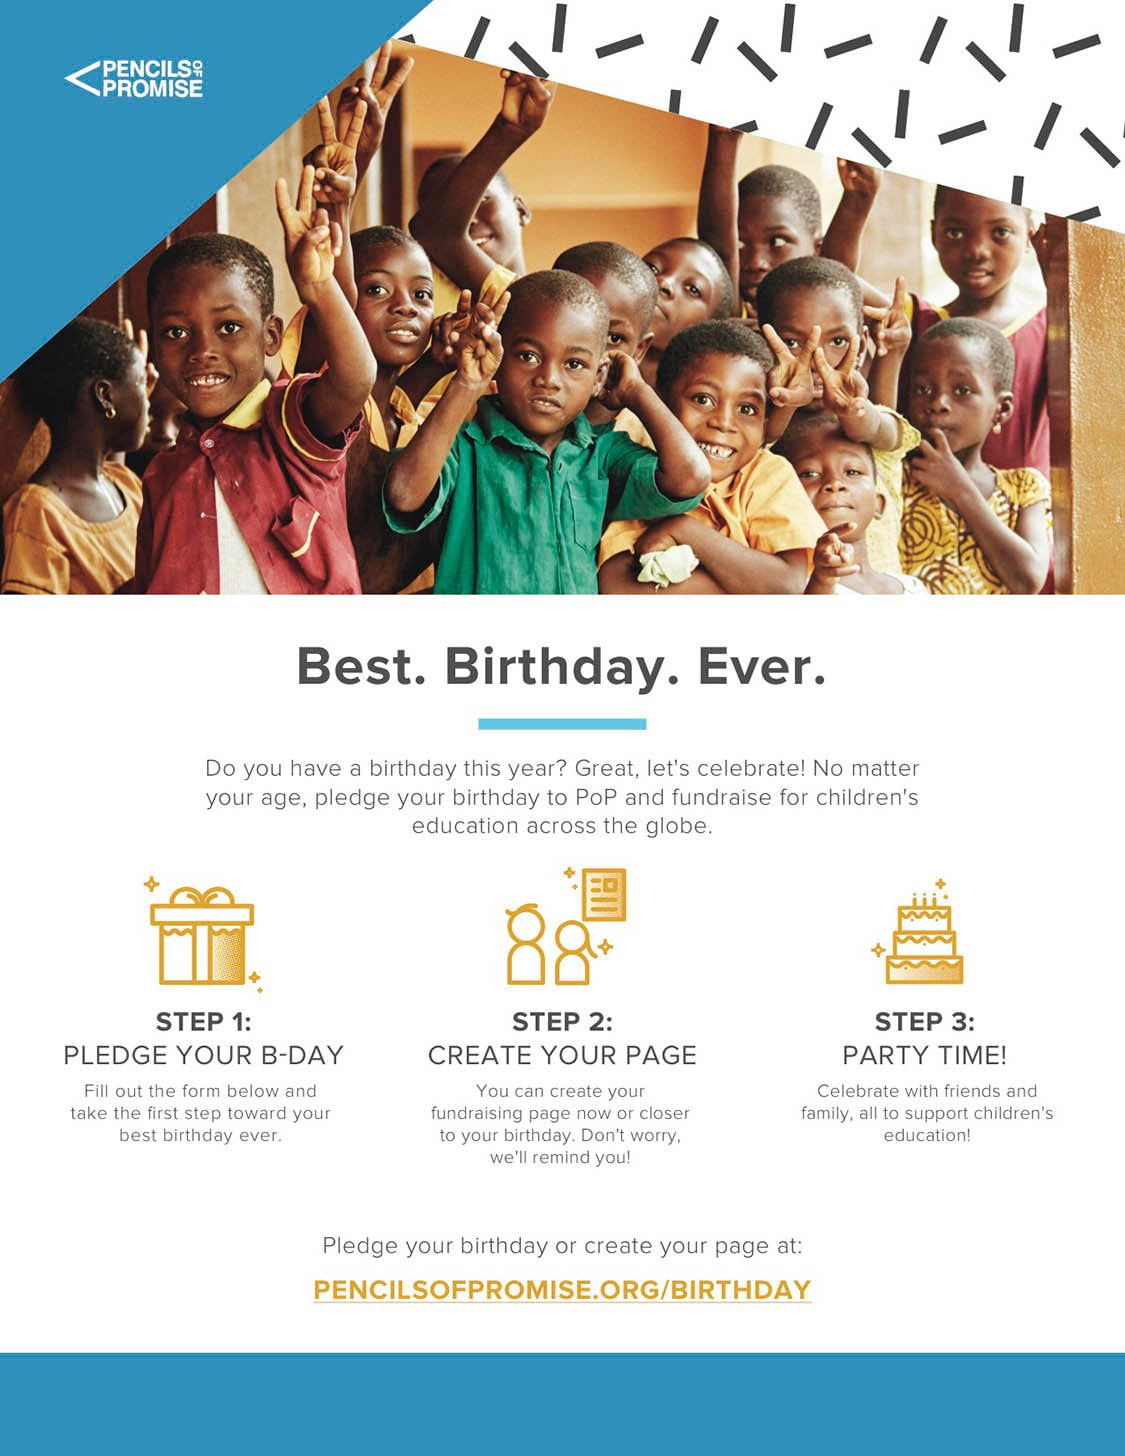 nonprofit-penciofpromise-birthdaypost